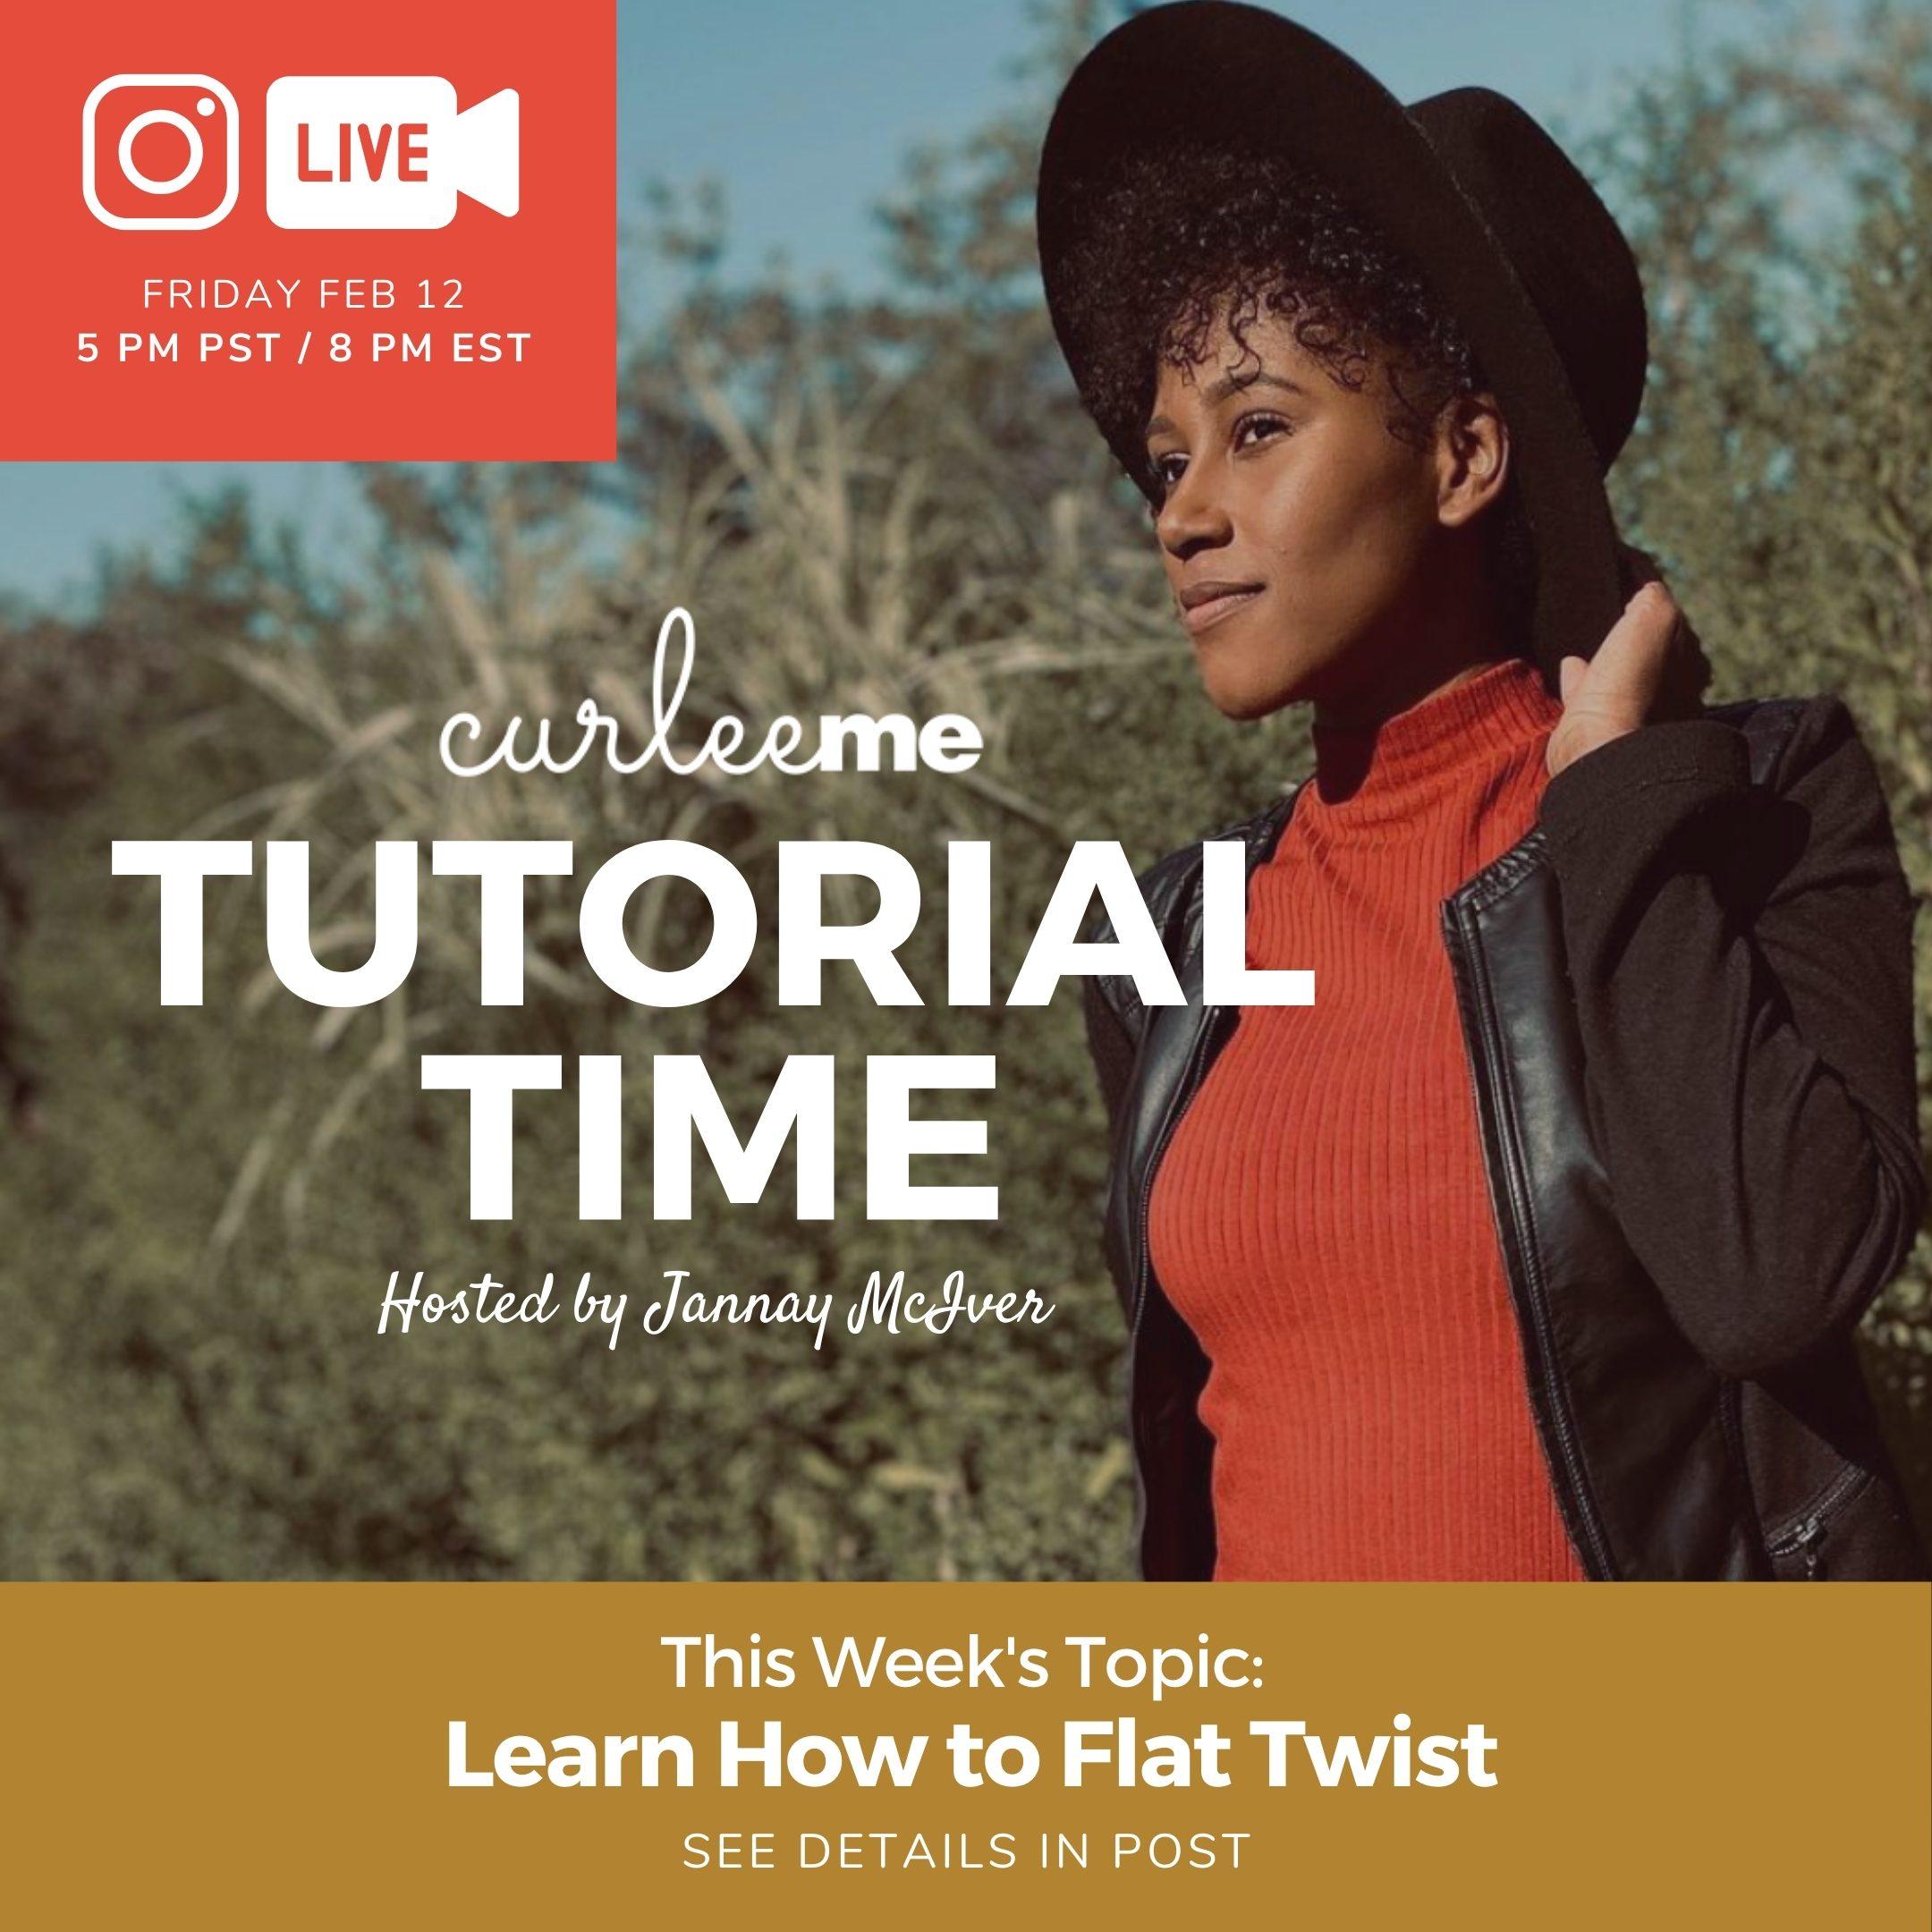 flat twist tutorial with Jannay McIver